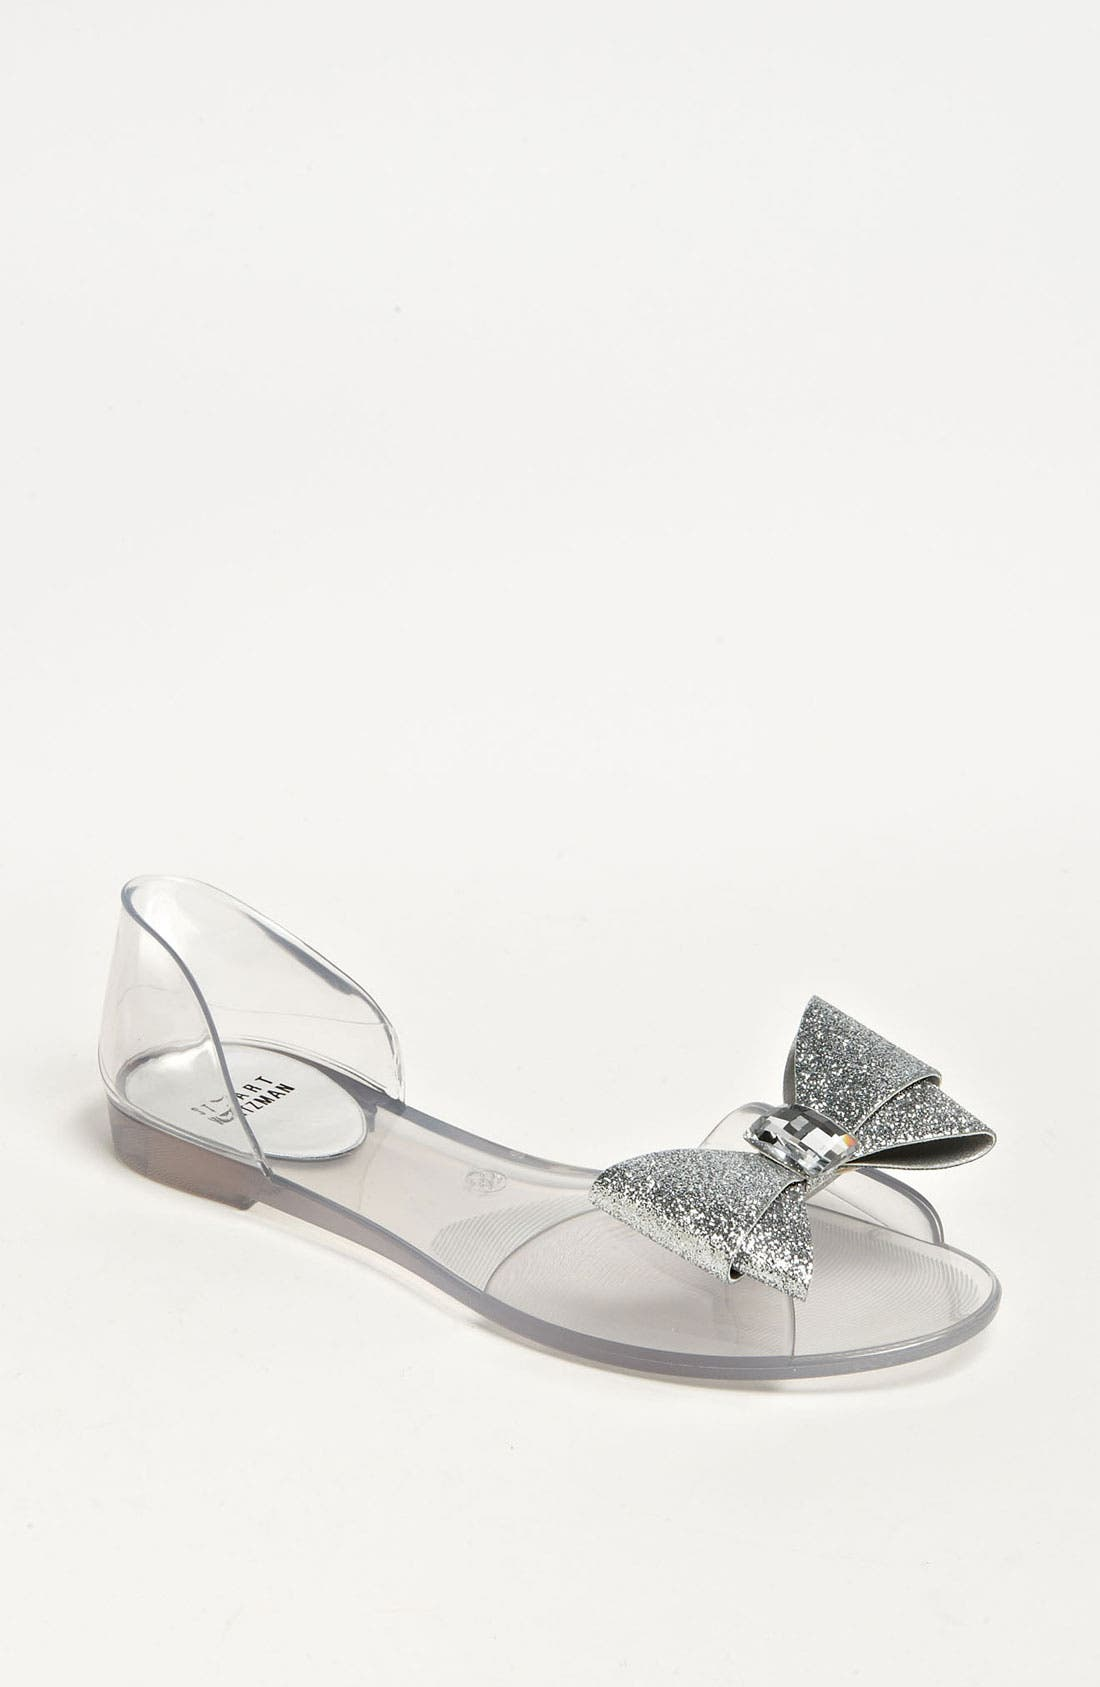 Alternate Image 1 Selected - Stuart Weitzman 'Gemini' Sandal